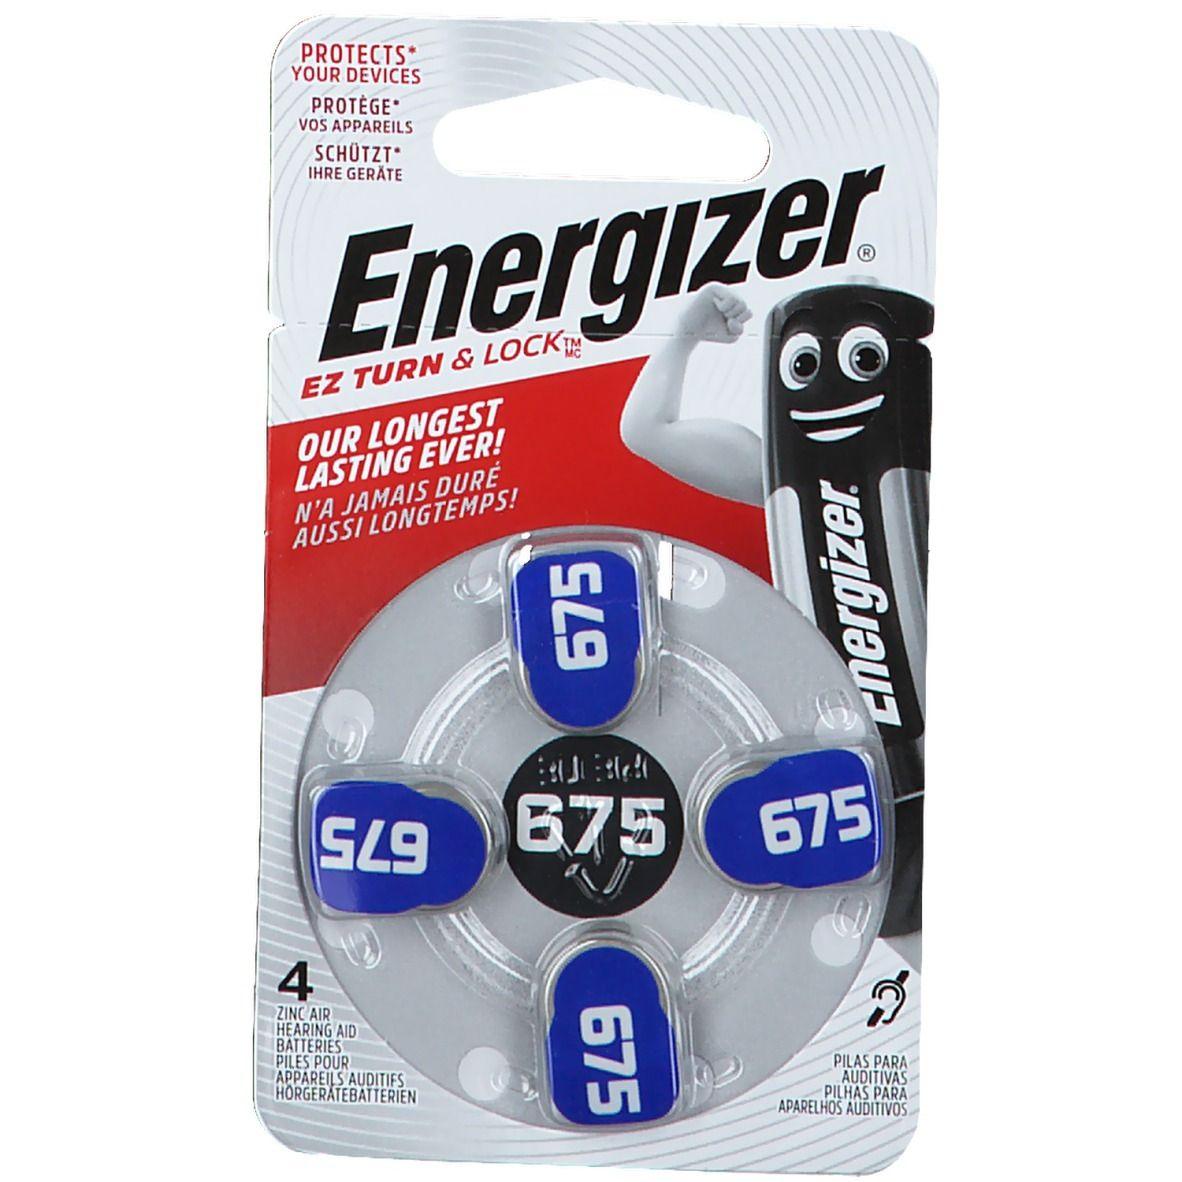 Energizer® Hörgerätebatterien 675 blau